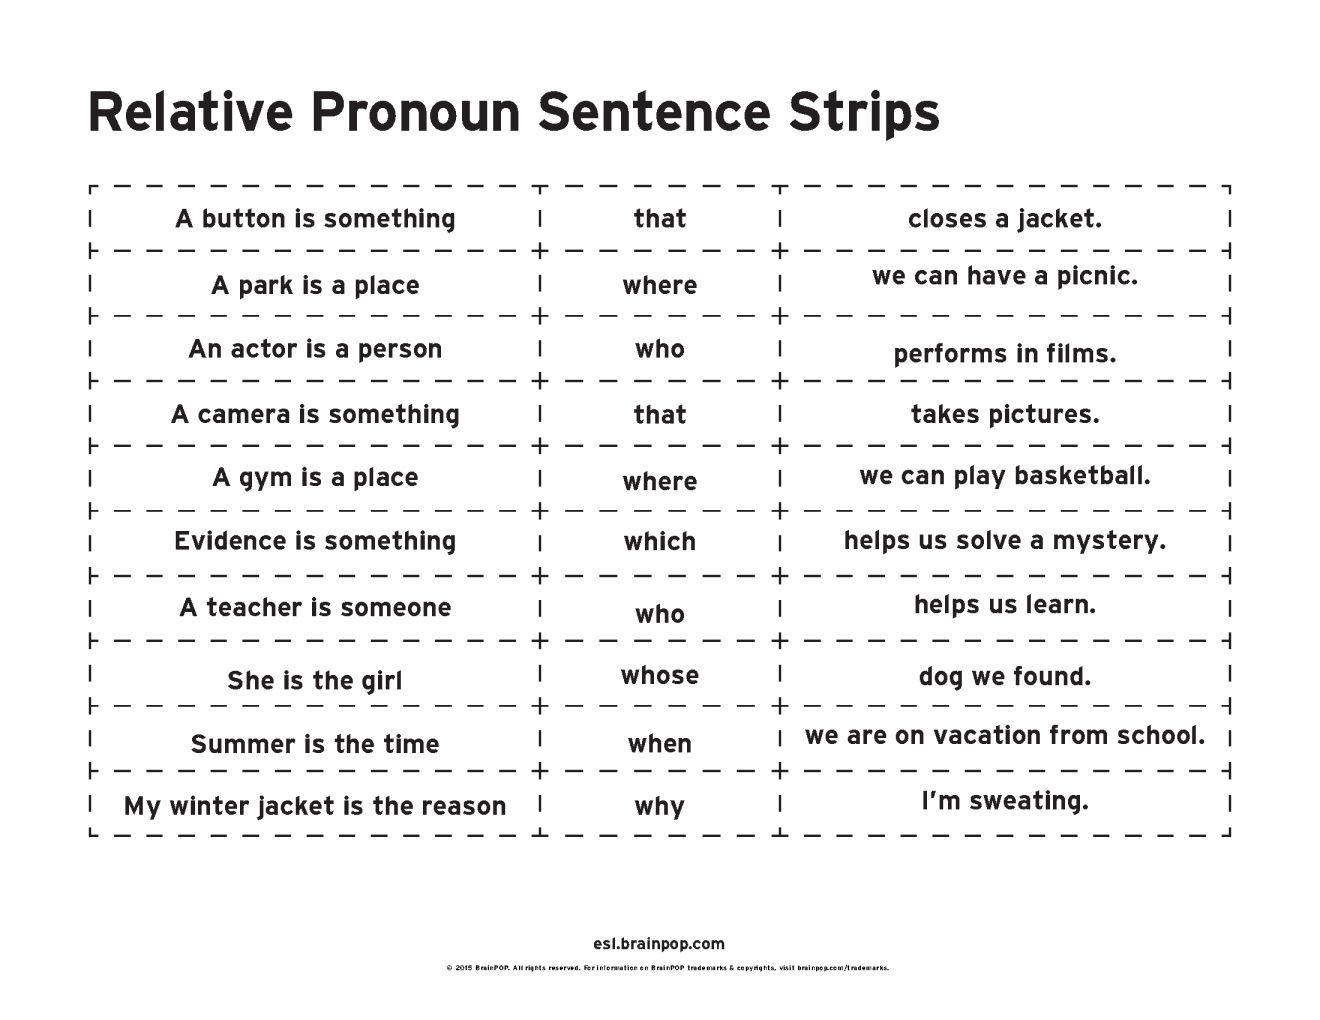 17 Relative Pronouns Worksheet 4th Grade In 2020 Pronoun Sentences Relative Pronouns Sentence Strips